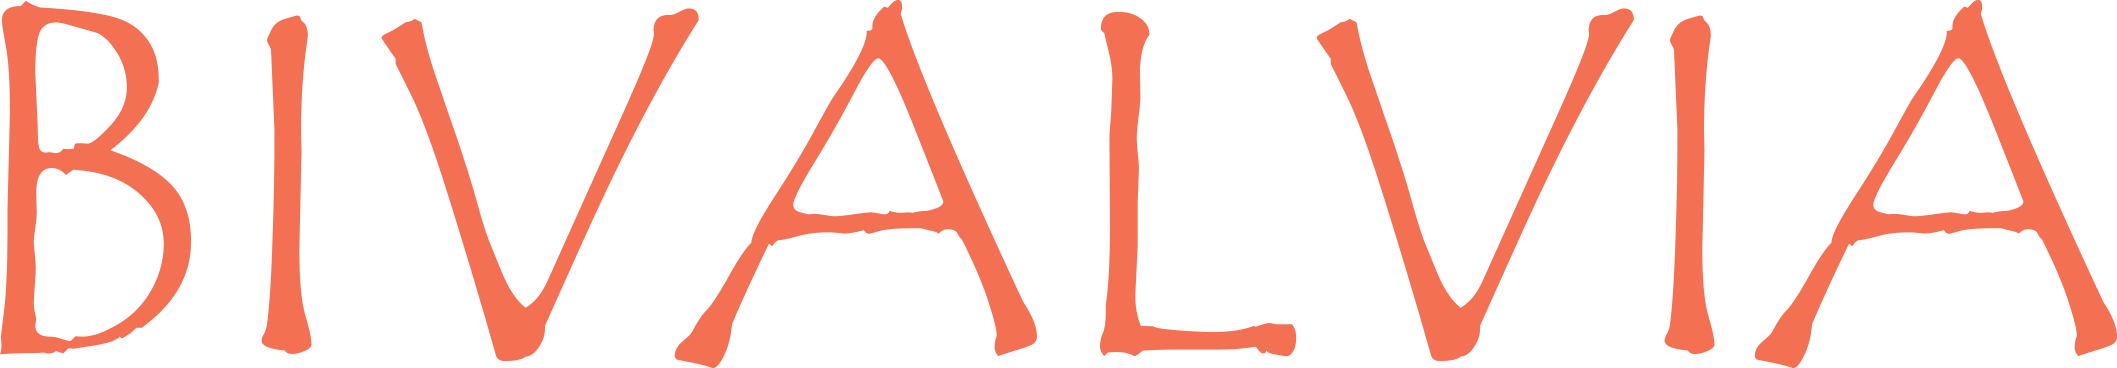 Bivalvia Logo